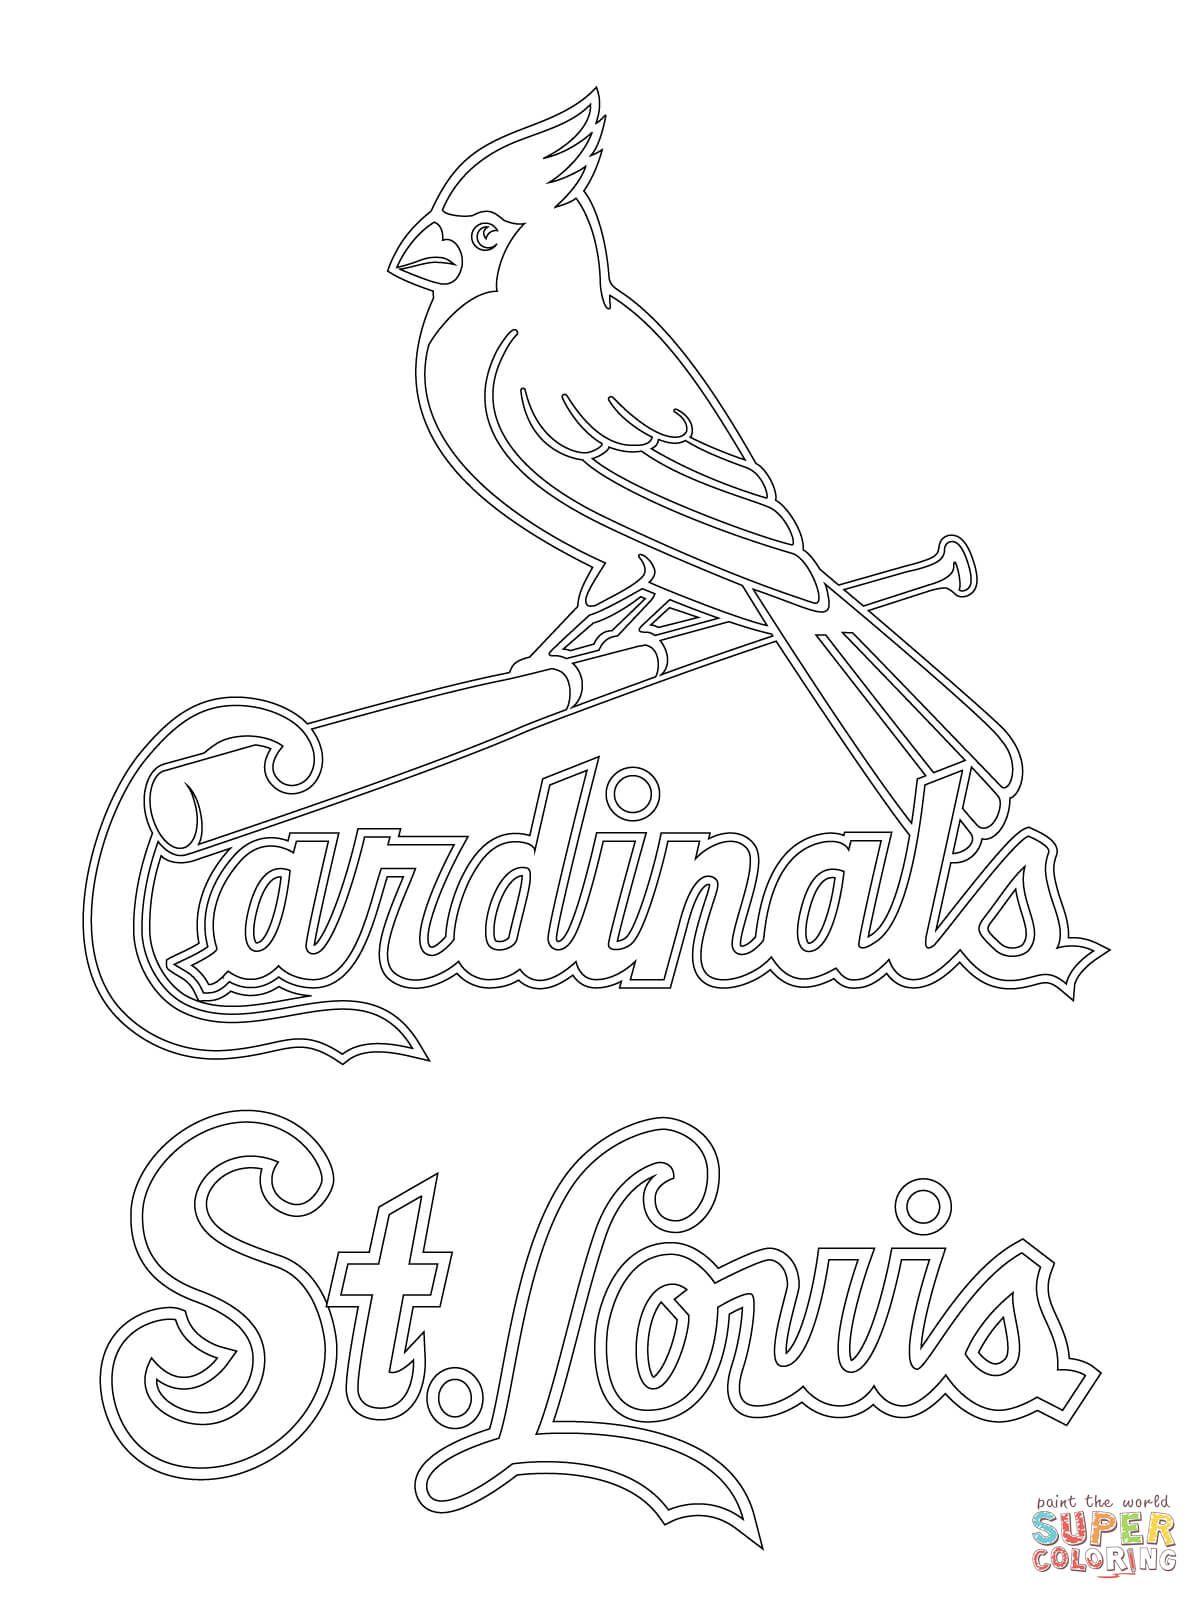 St. Louis Cardinals Logo | Super Coloring | St. Louis Cardinals and ...